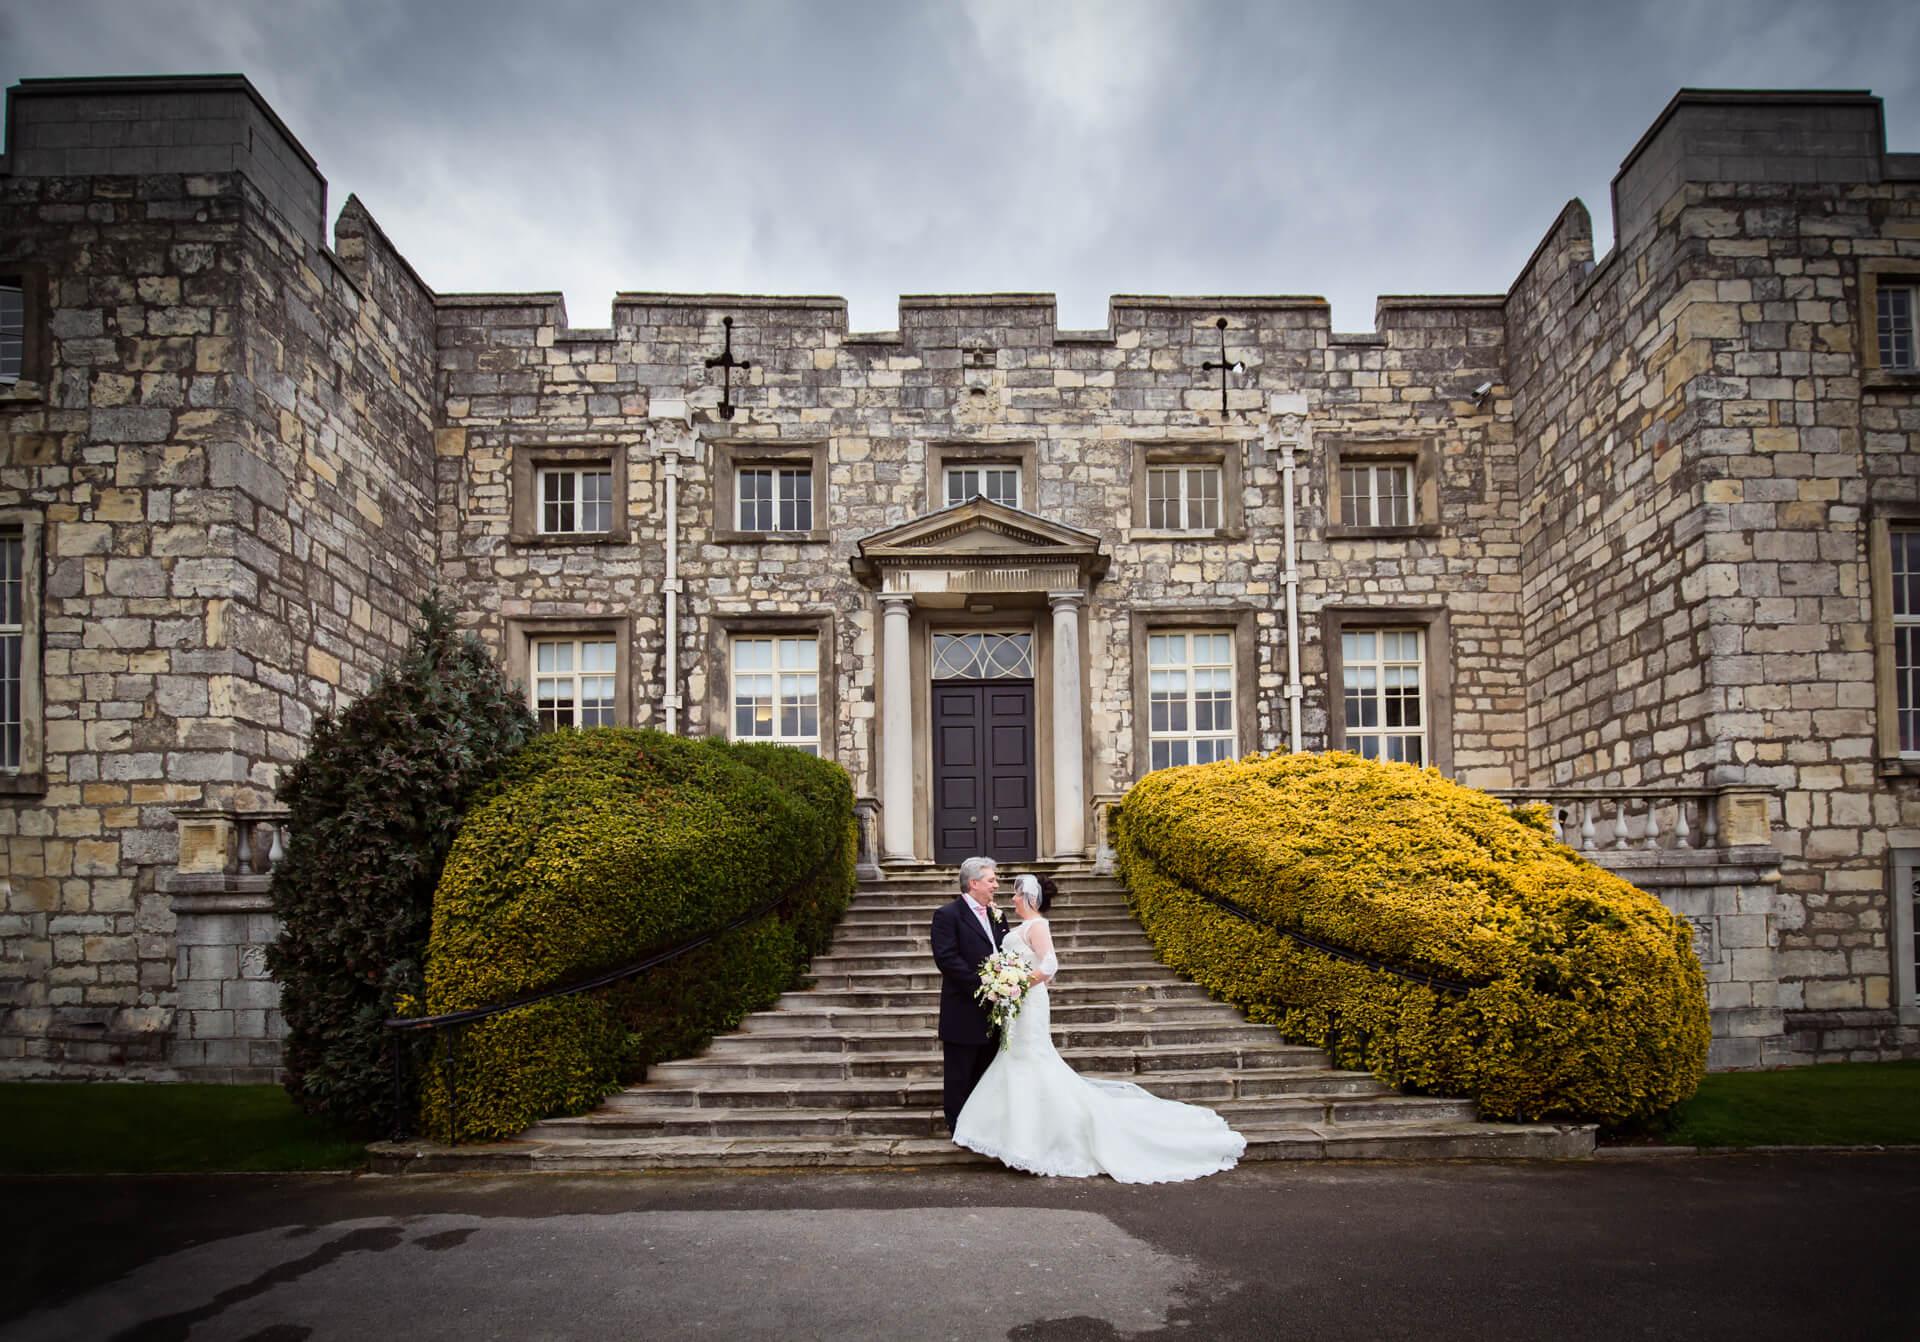 Hazlewood Castle wedding photographer - wedding couple portrait